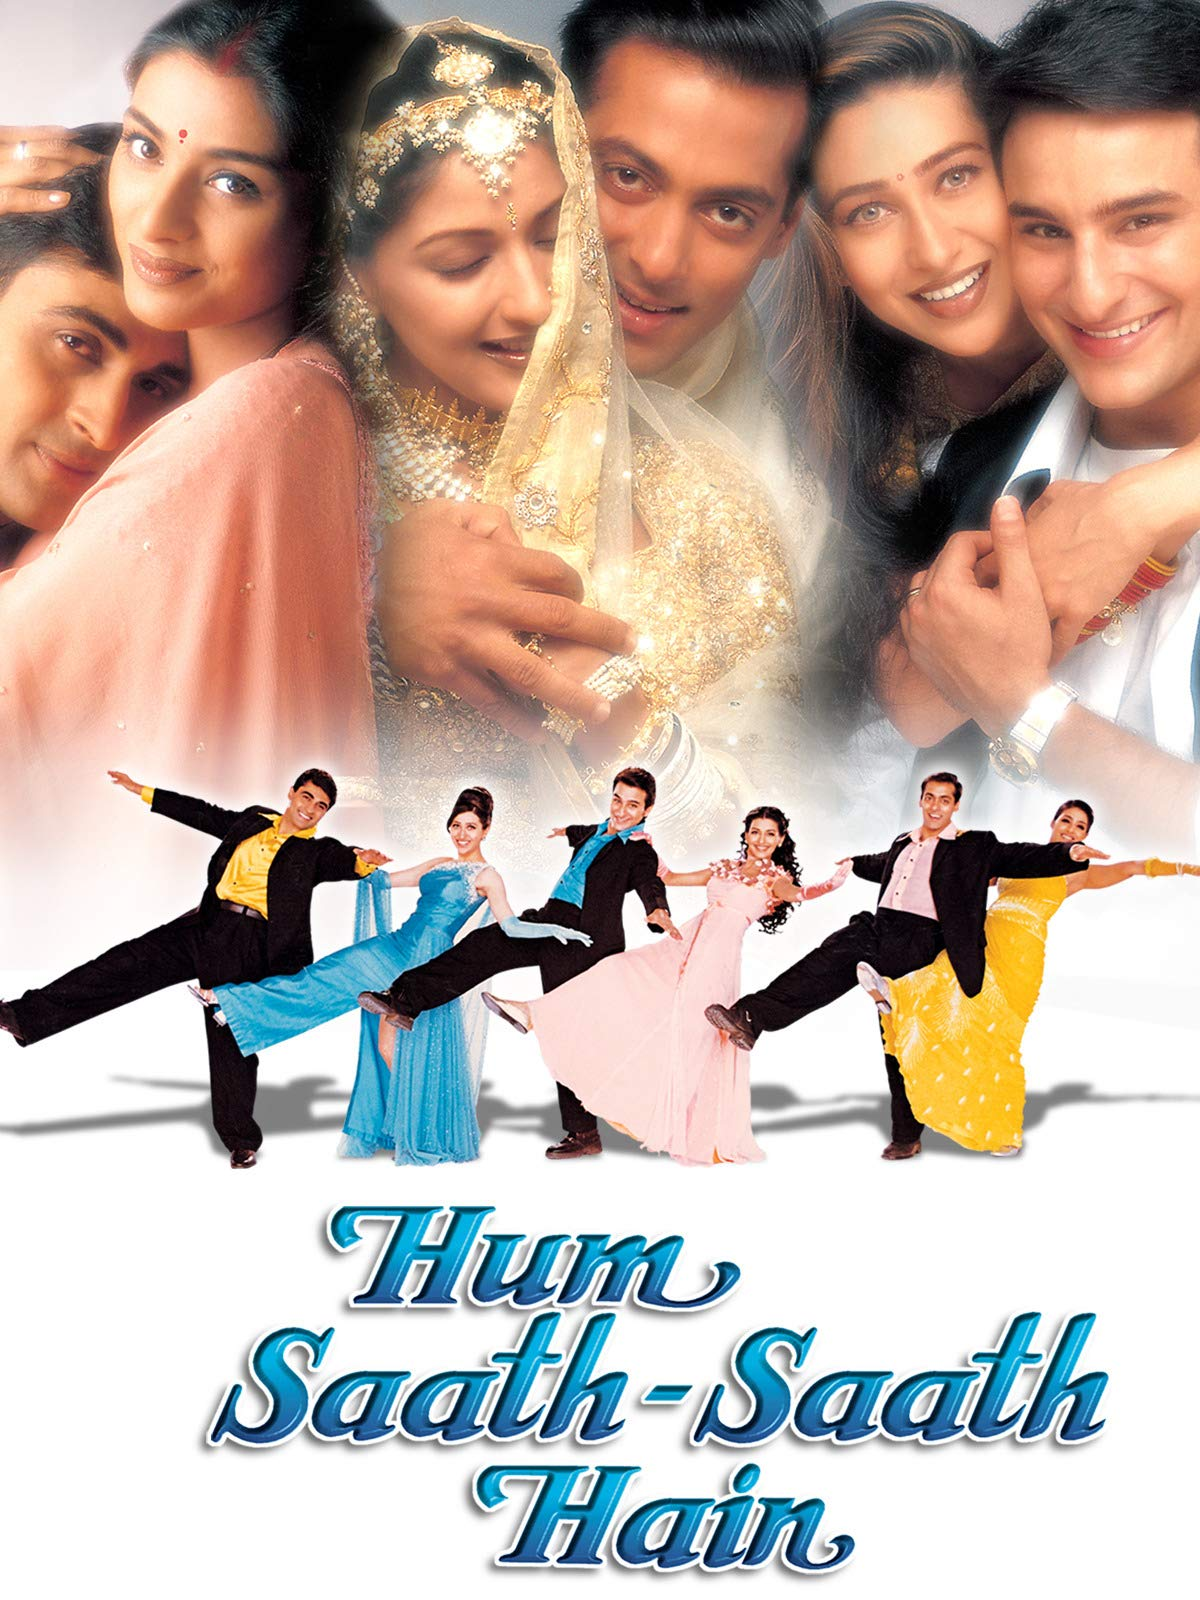 Amazon.com: Watch Hum Saath-Saath Hain | Prime Video